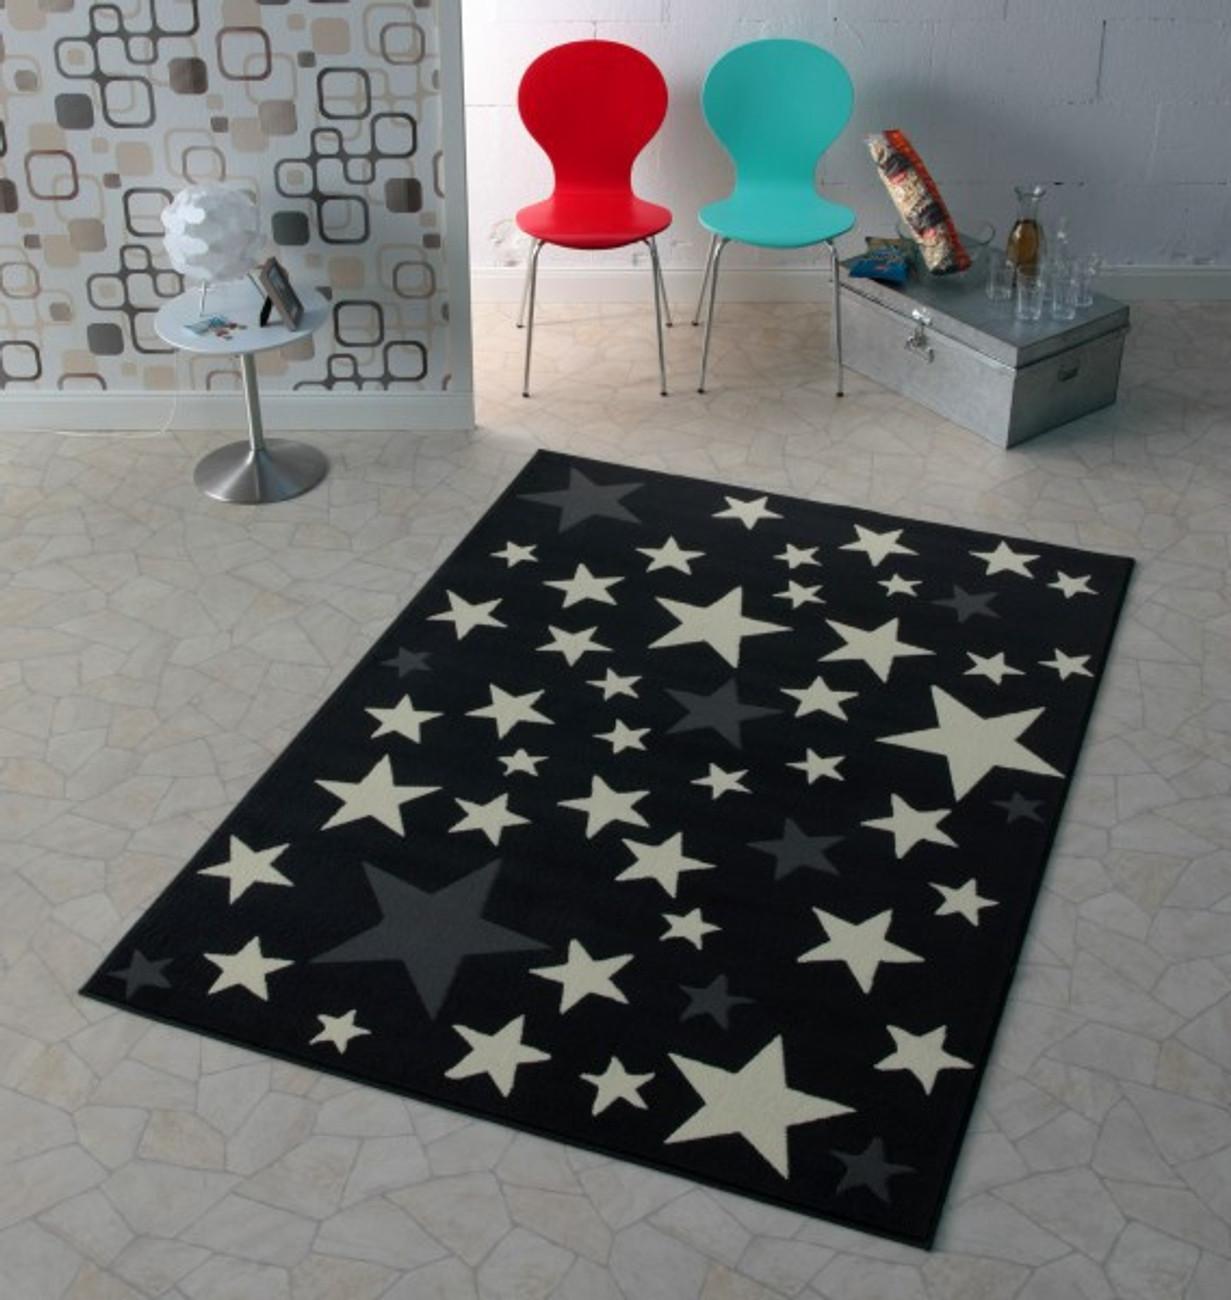 design velours teppich sterne grau 140x200 cm 102167 teppiche design teppiche. Black Bedroom Furniture Sets. Home Design Ideas